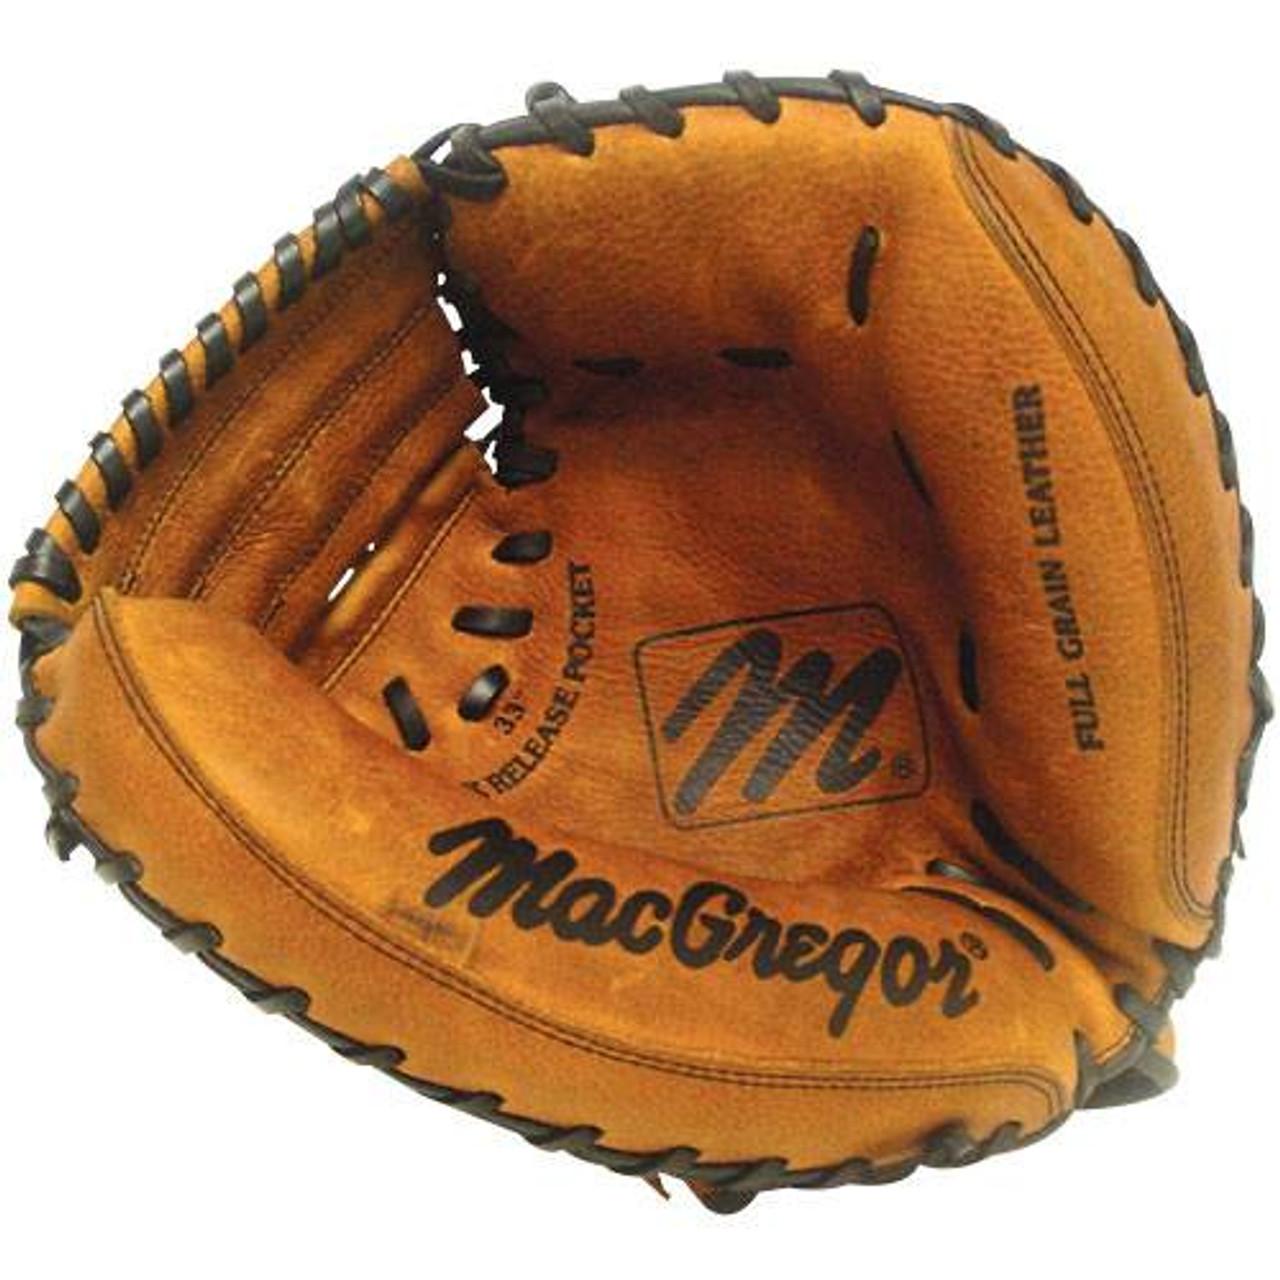 MAC Varsity Series Baseball Catchers Mitt RHT